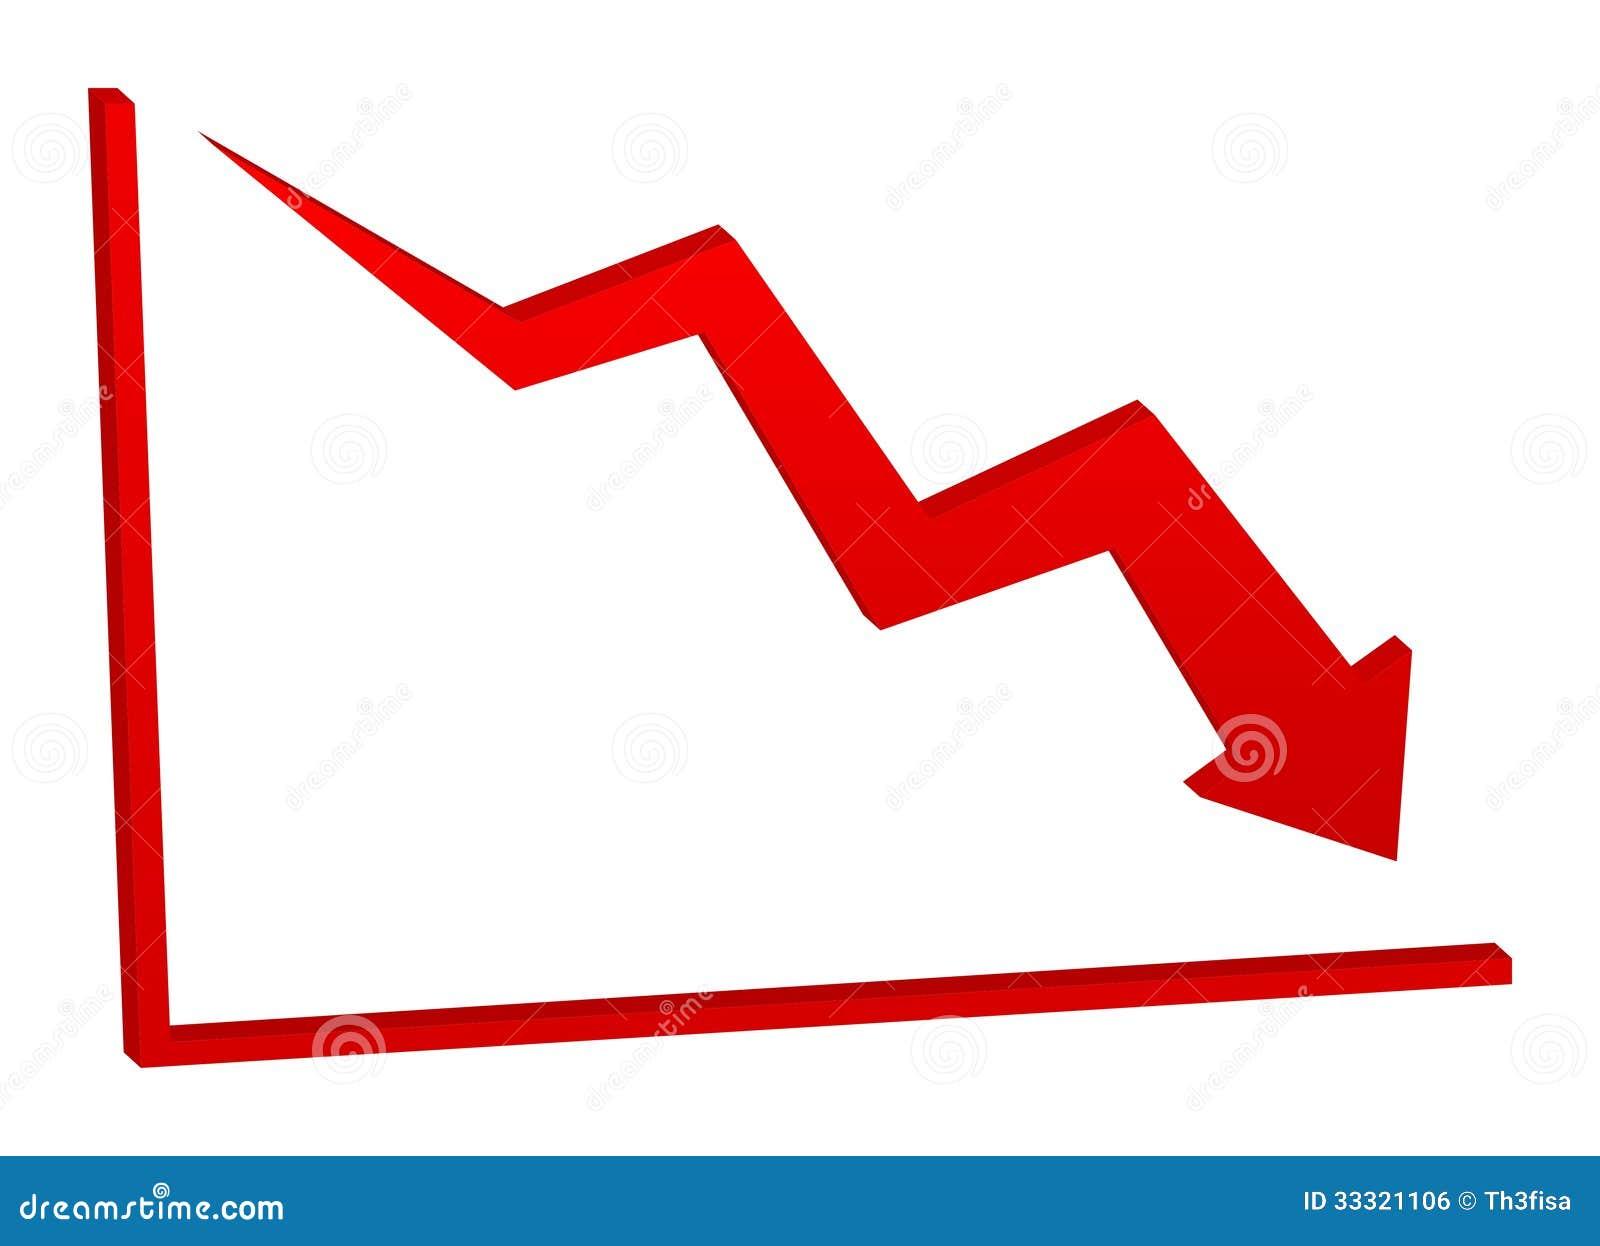 Royalty Free Stock Image  Decreasing red arrow on the chartDecrease Arrow